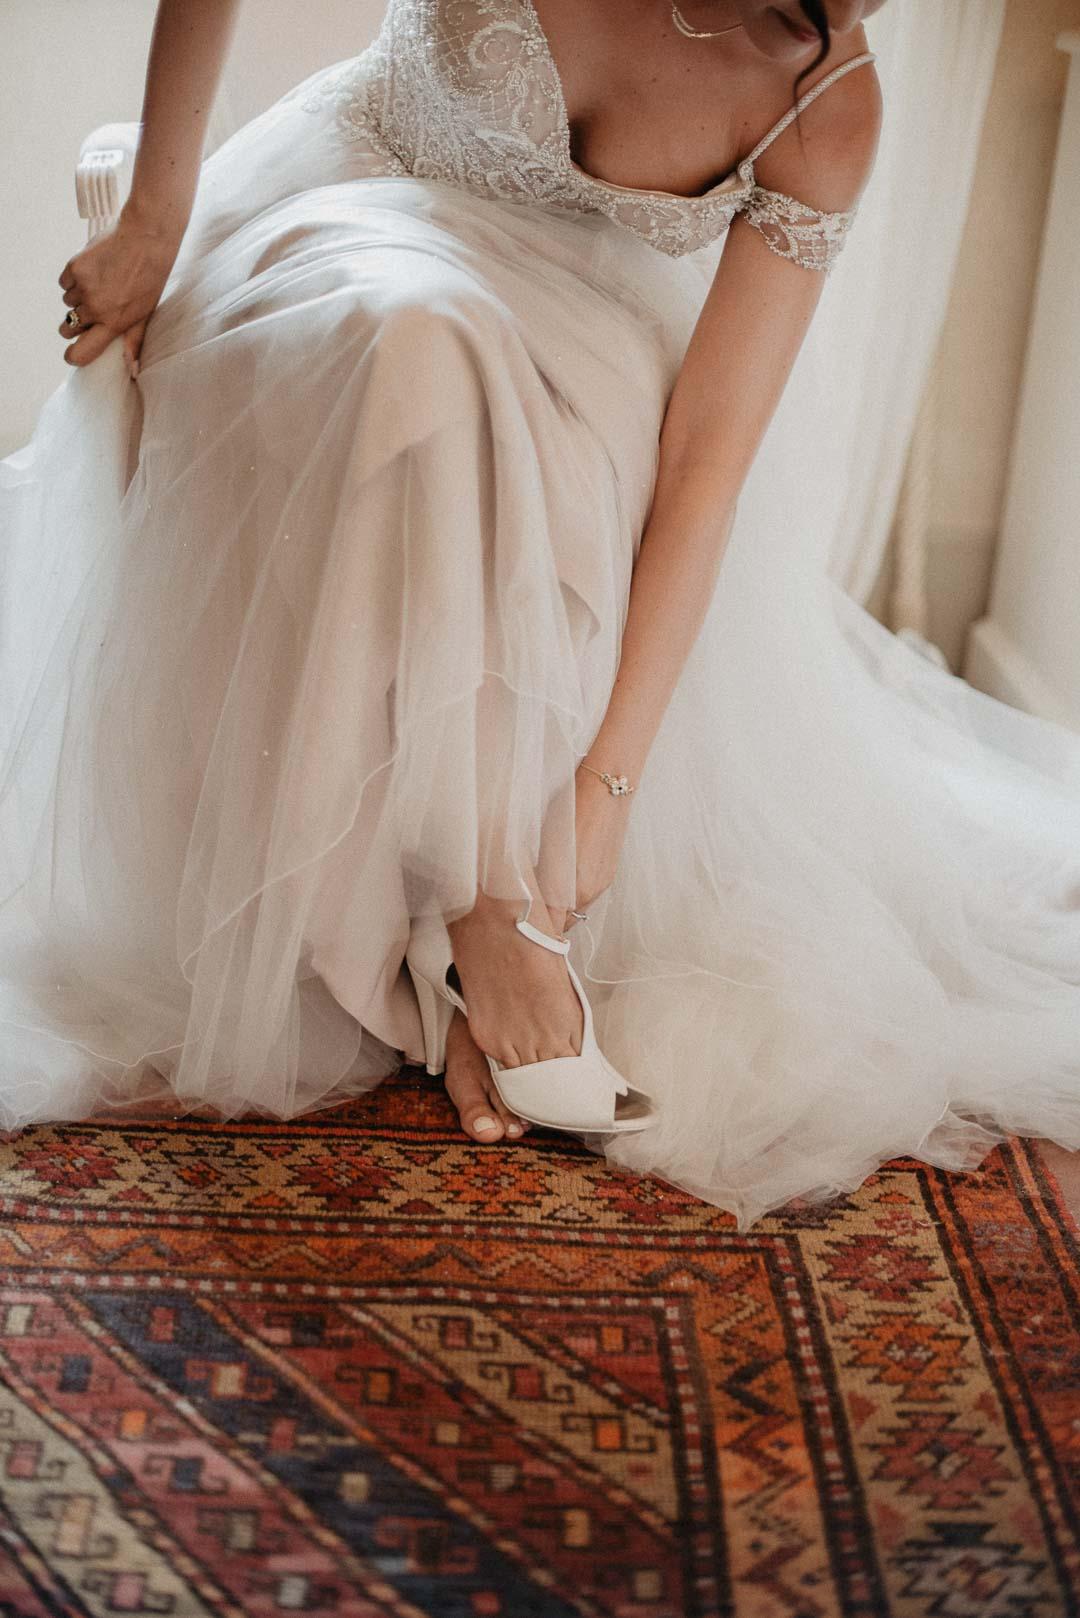 wedding-photographer-destination-fineart-bespoke-reportage-tuscany-villascorzi-vivianeizzo-spazio46-56